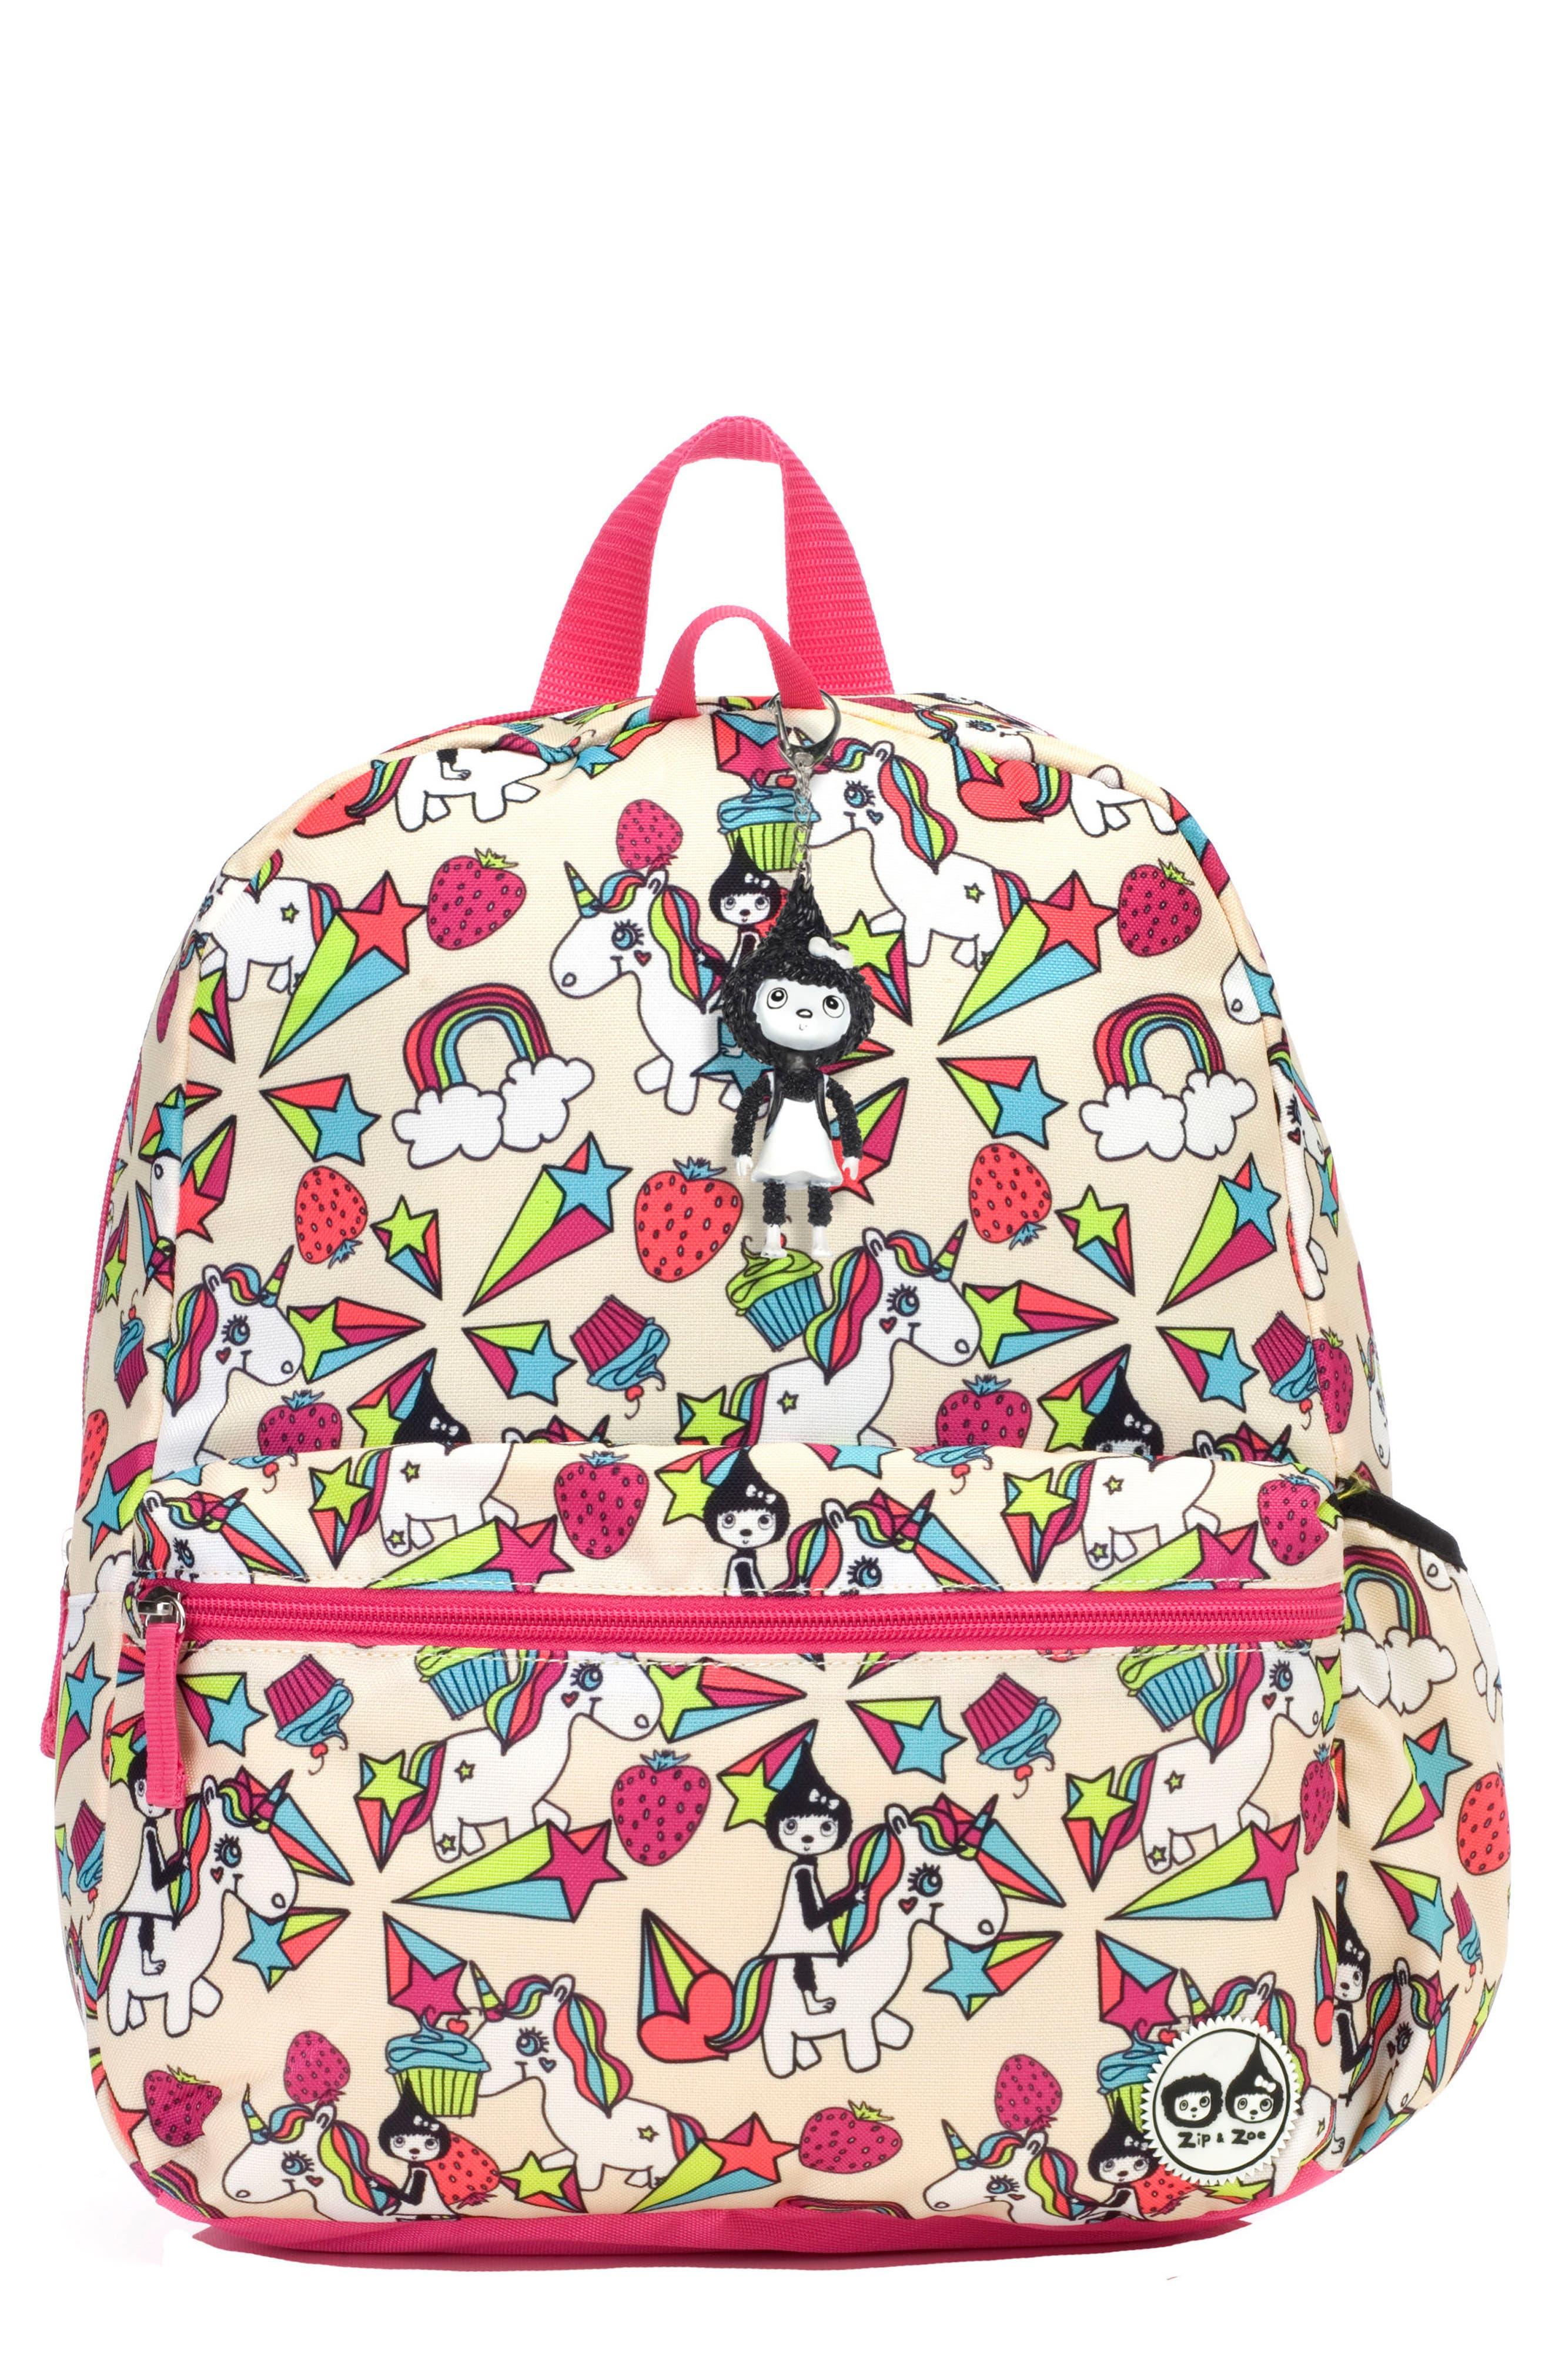 Zip & Zoe Unicorn Junior Backpack,                         Main,                         color, White